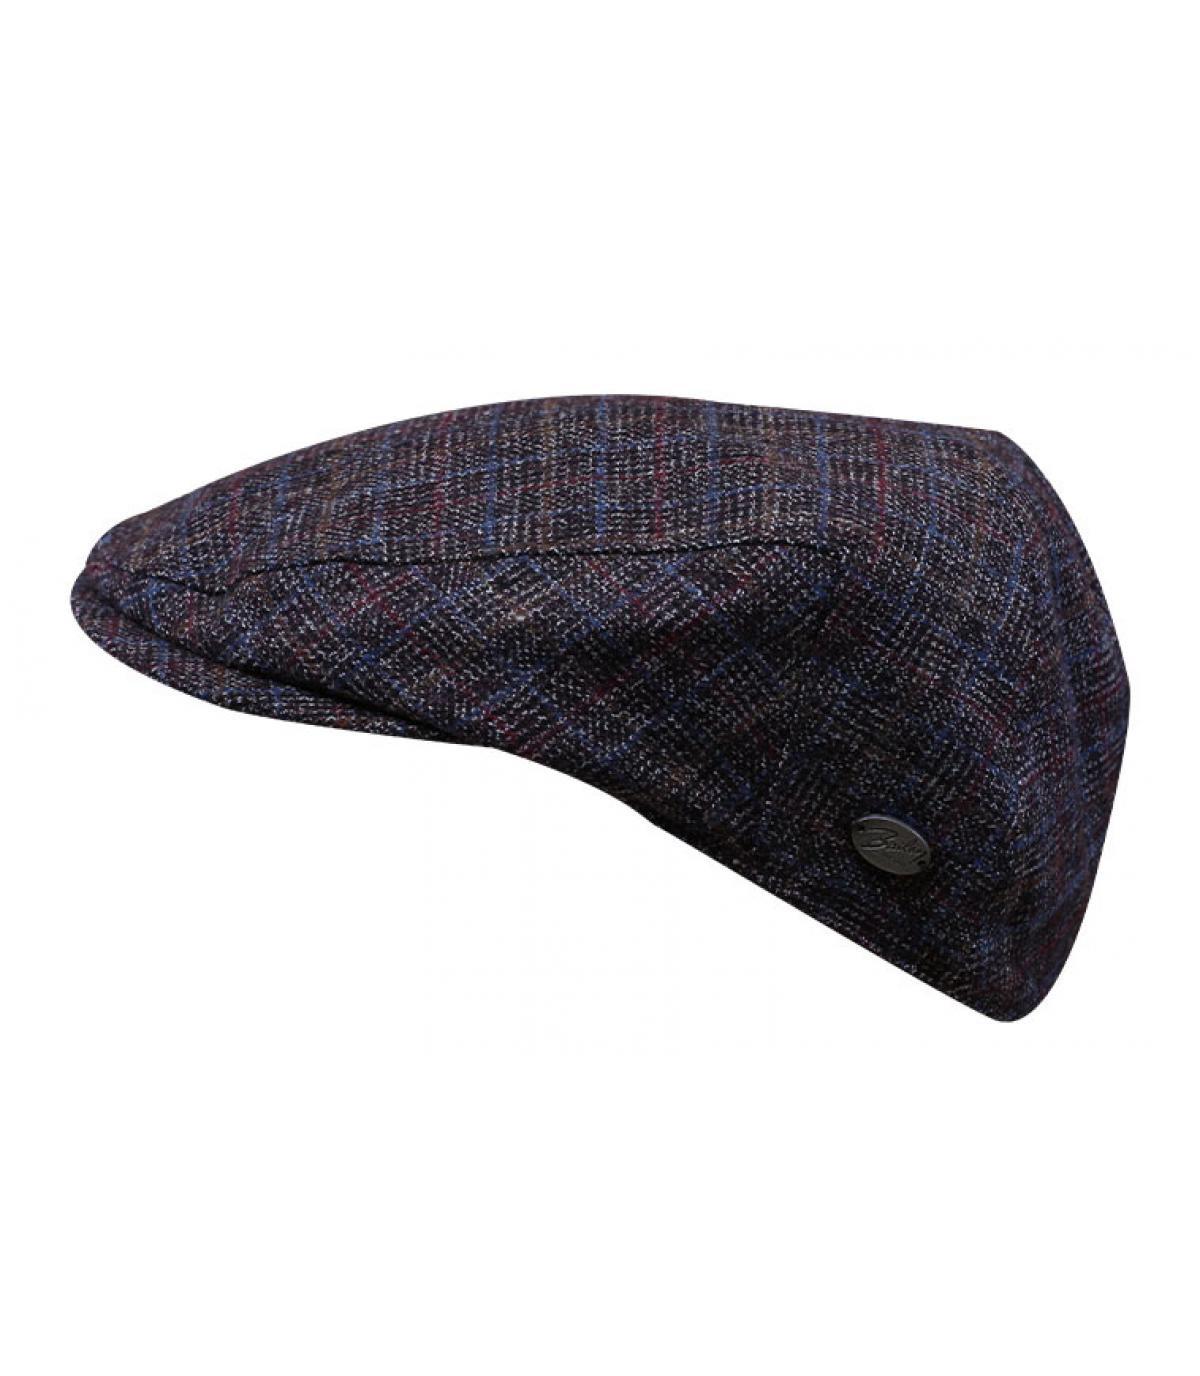 Burgundy checked flat cap